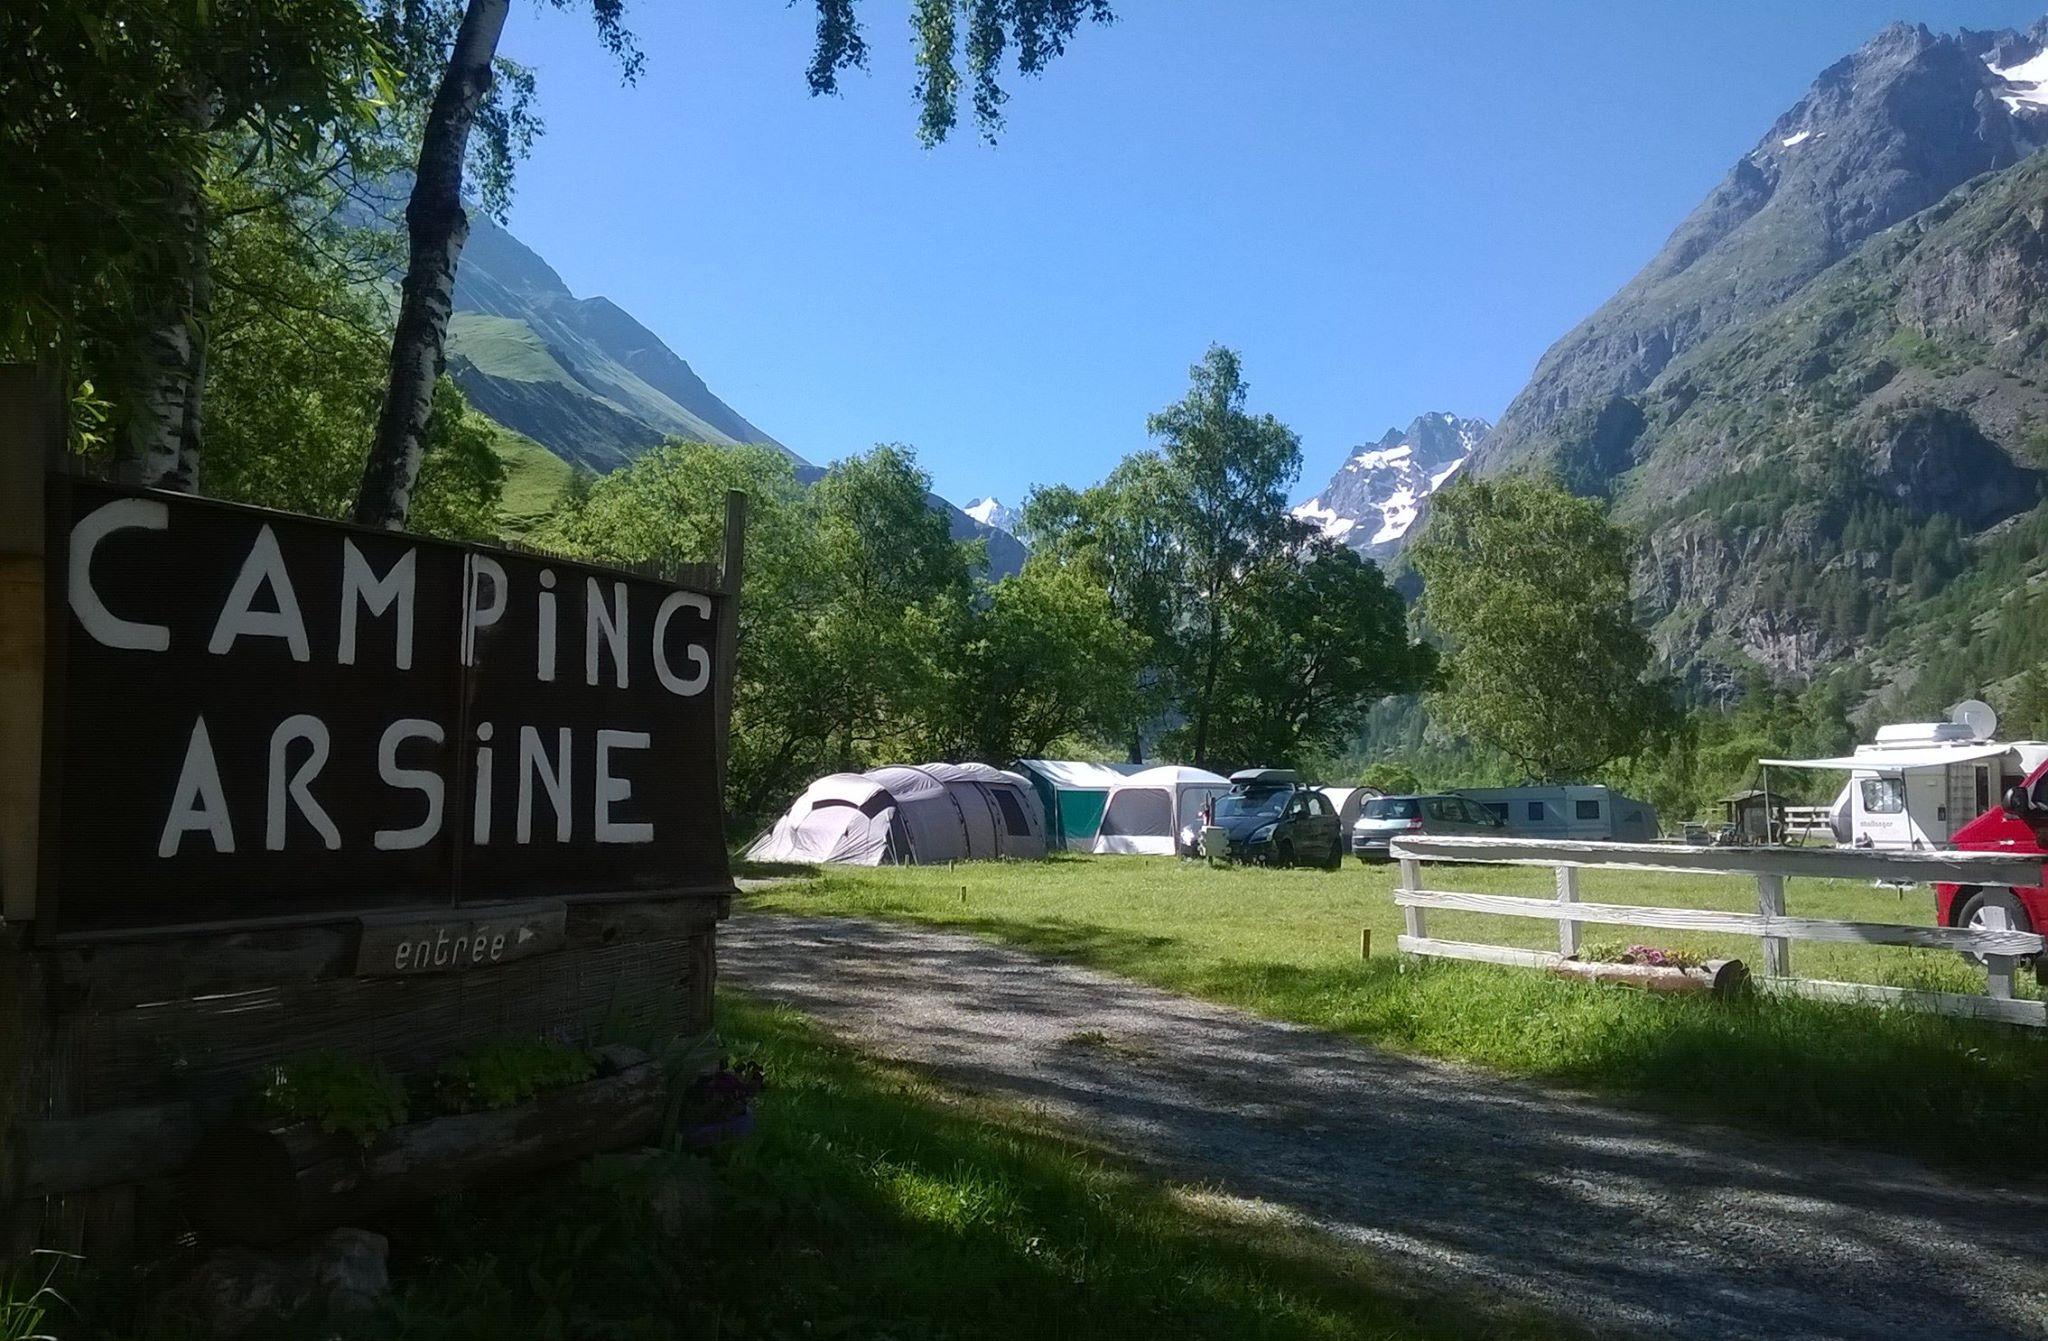 Camping Municipal d'Arsine